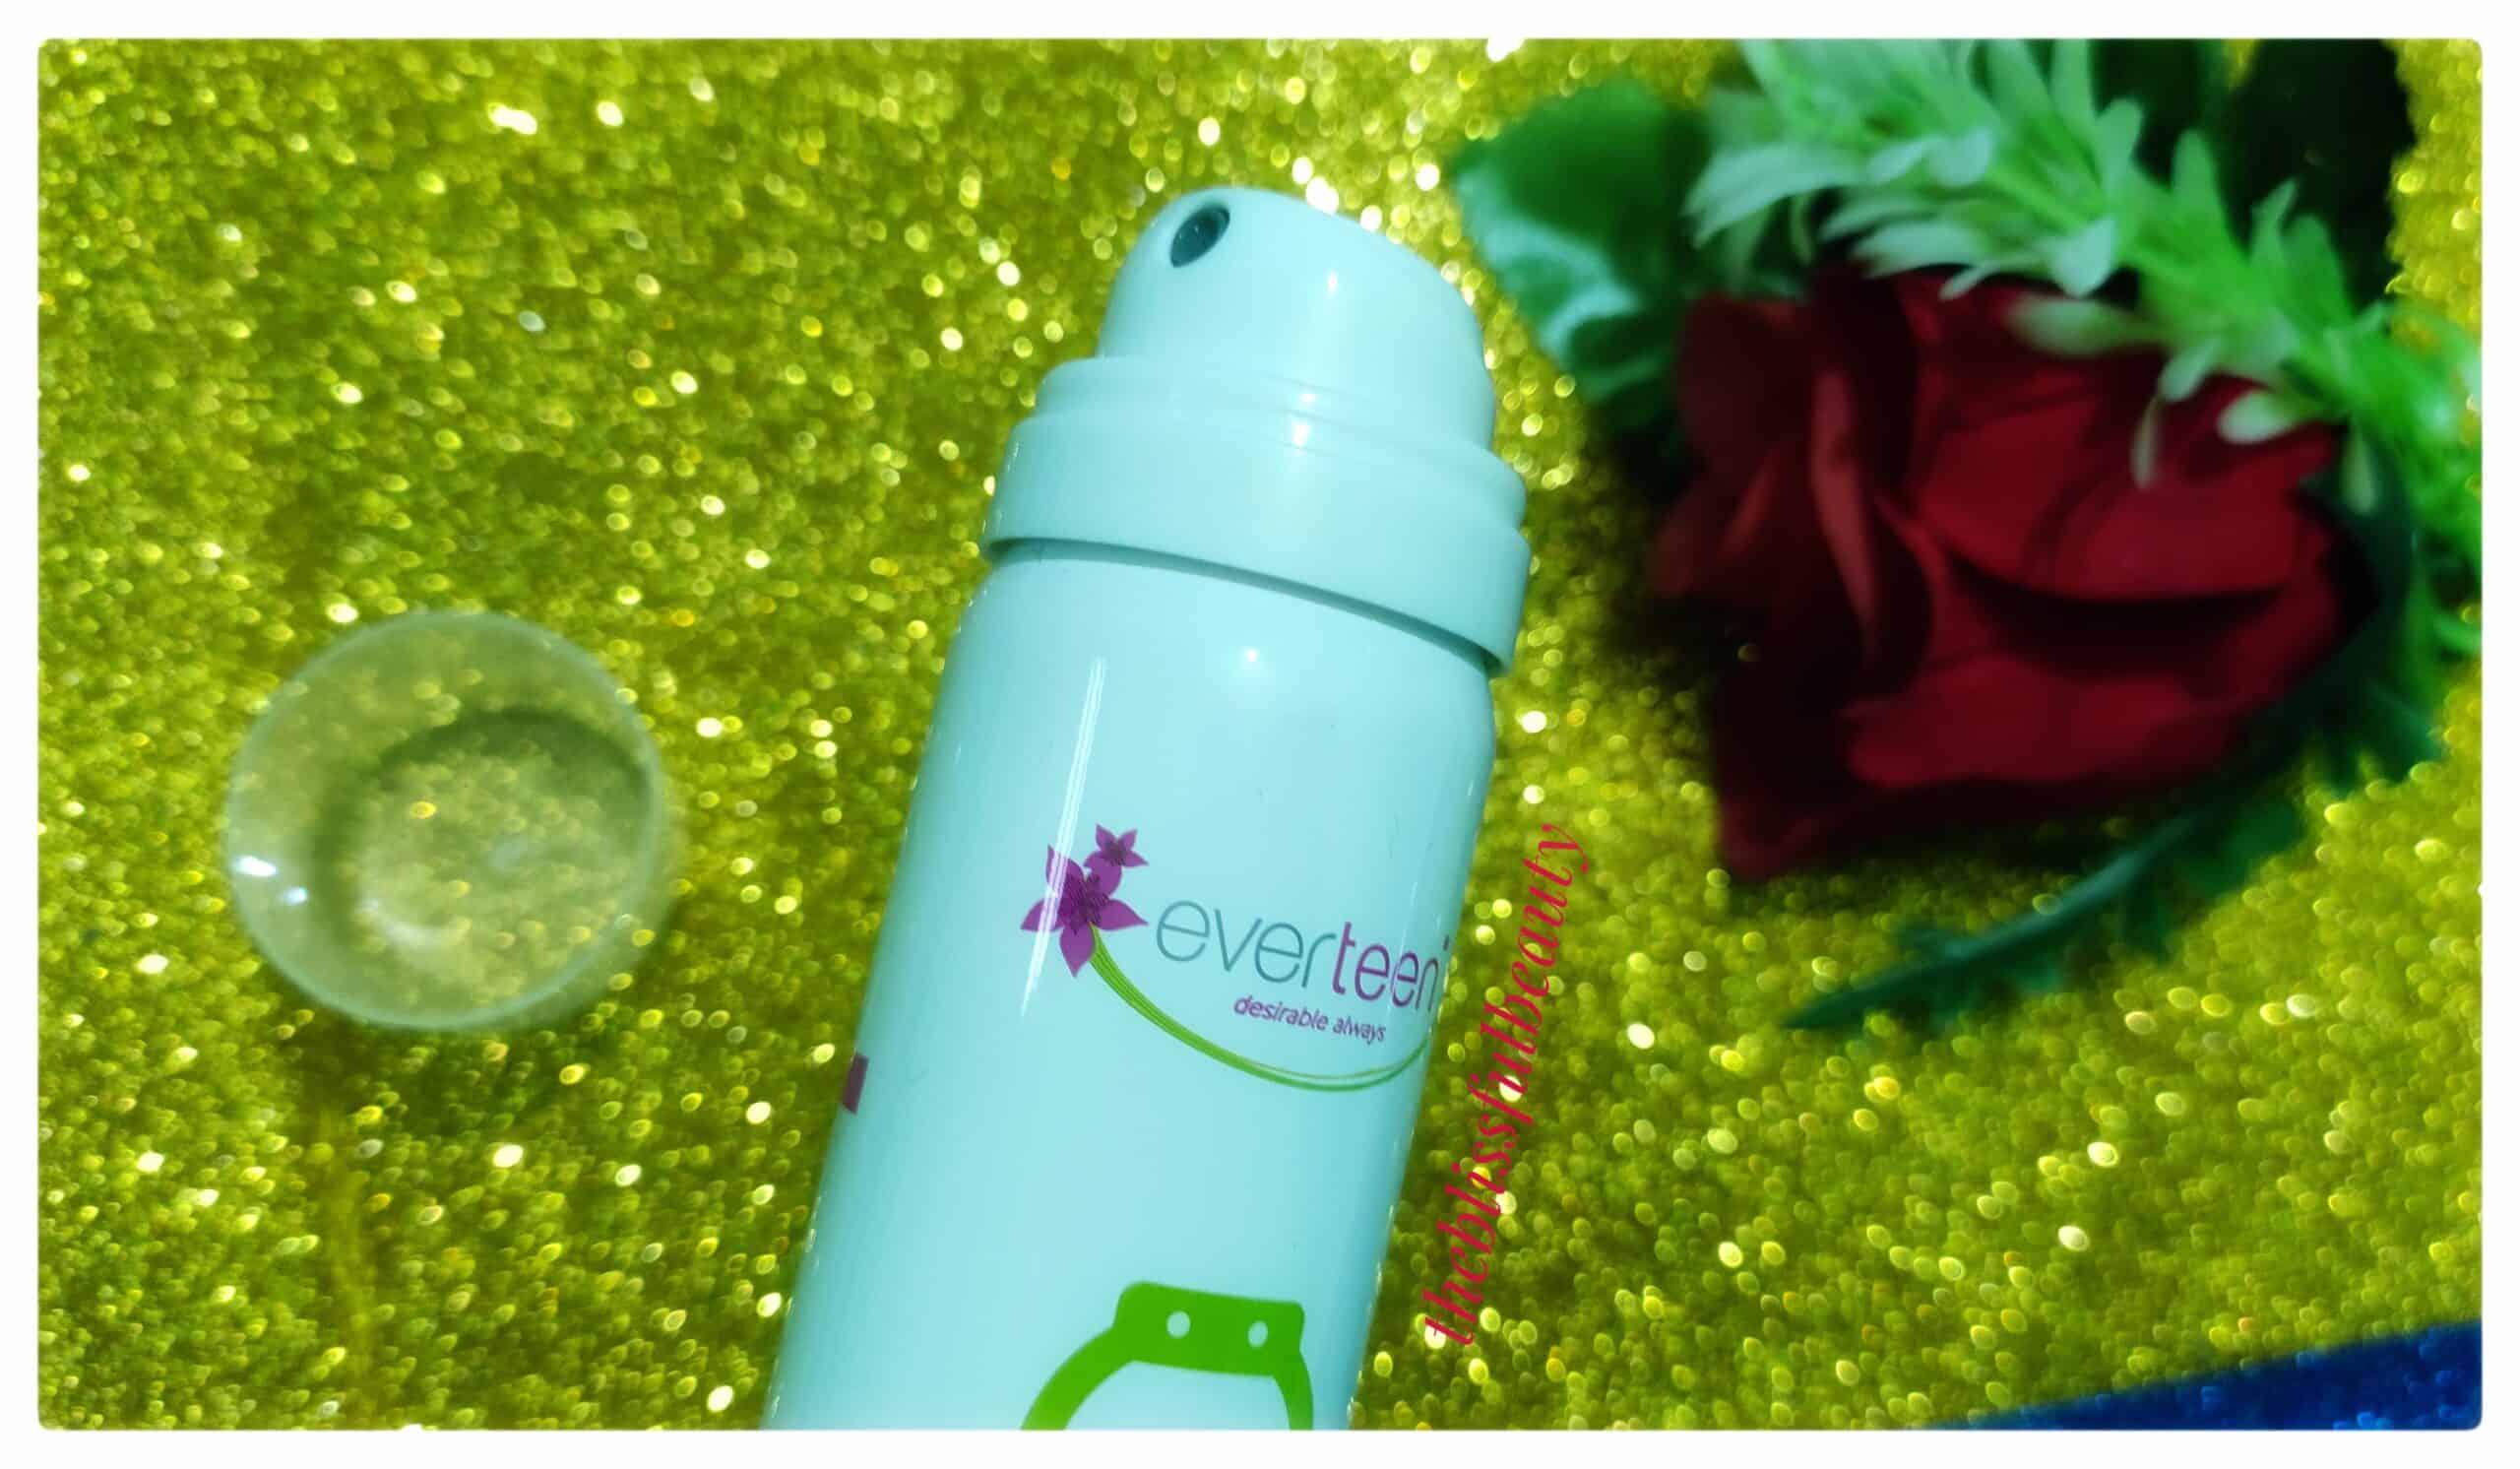 Everteen Toilet seat Sanitizer Review